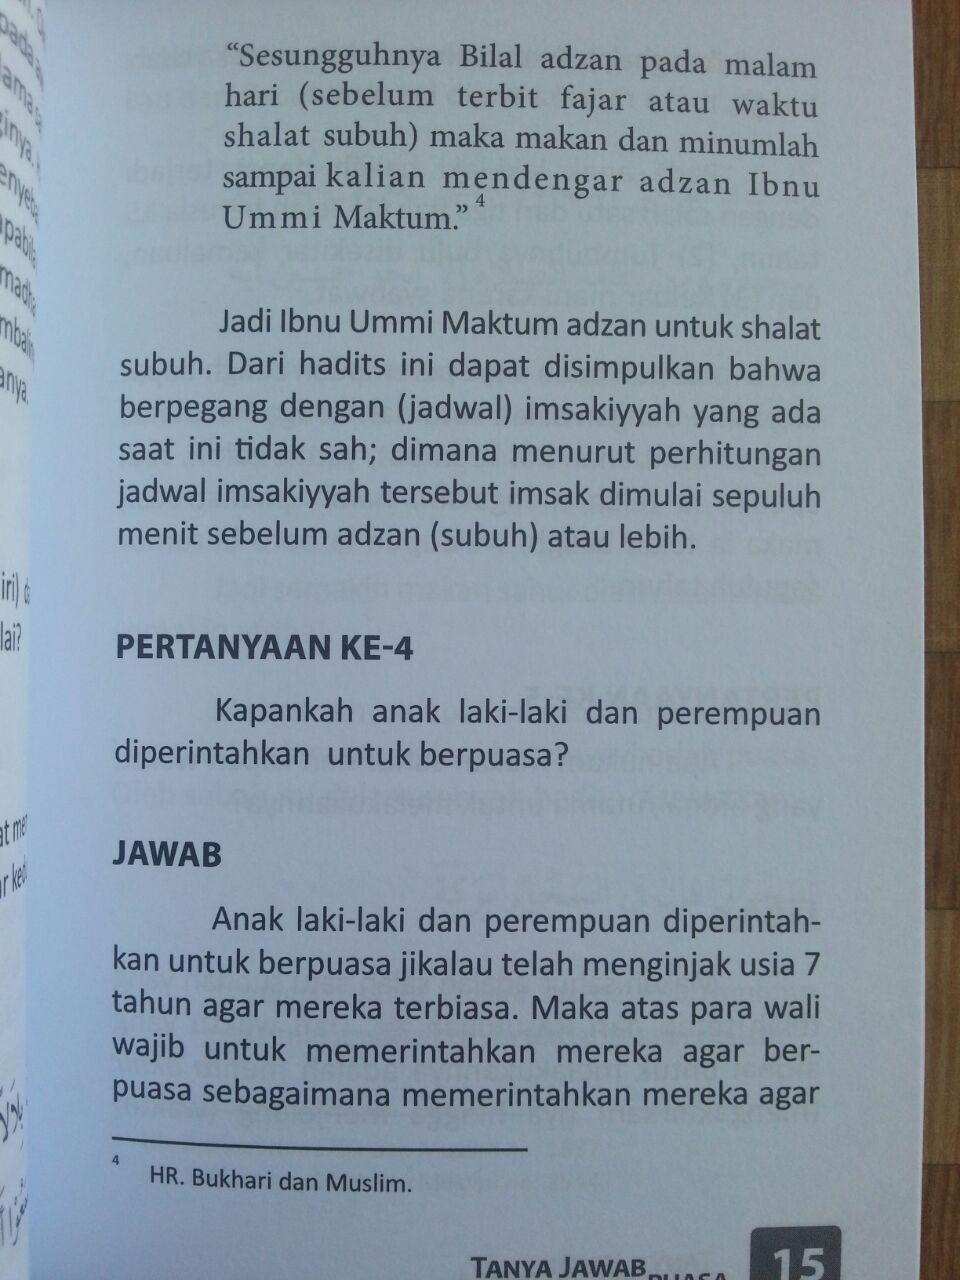 Buku Tanya Jawab Seputar Masalah Puasa isi 3